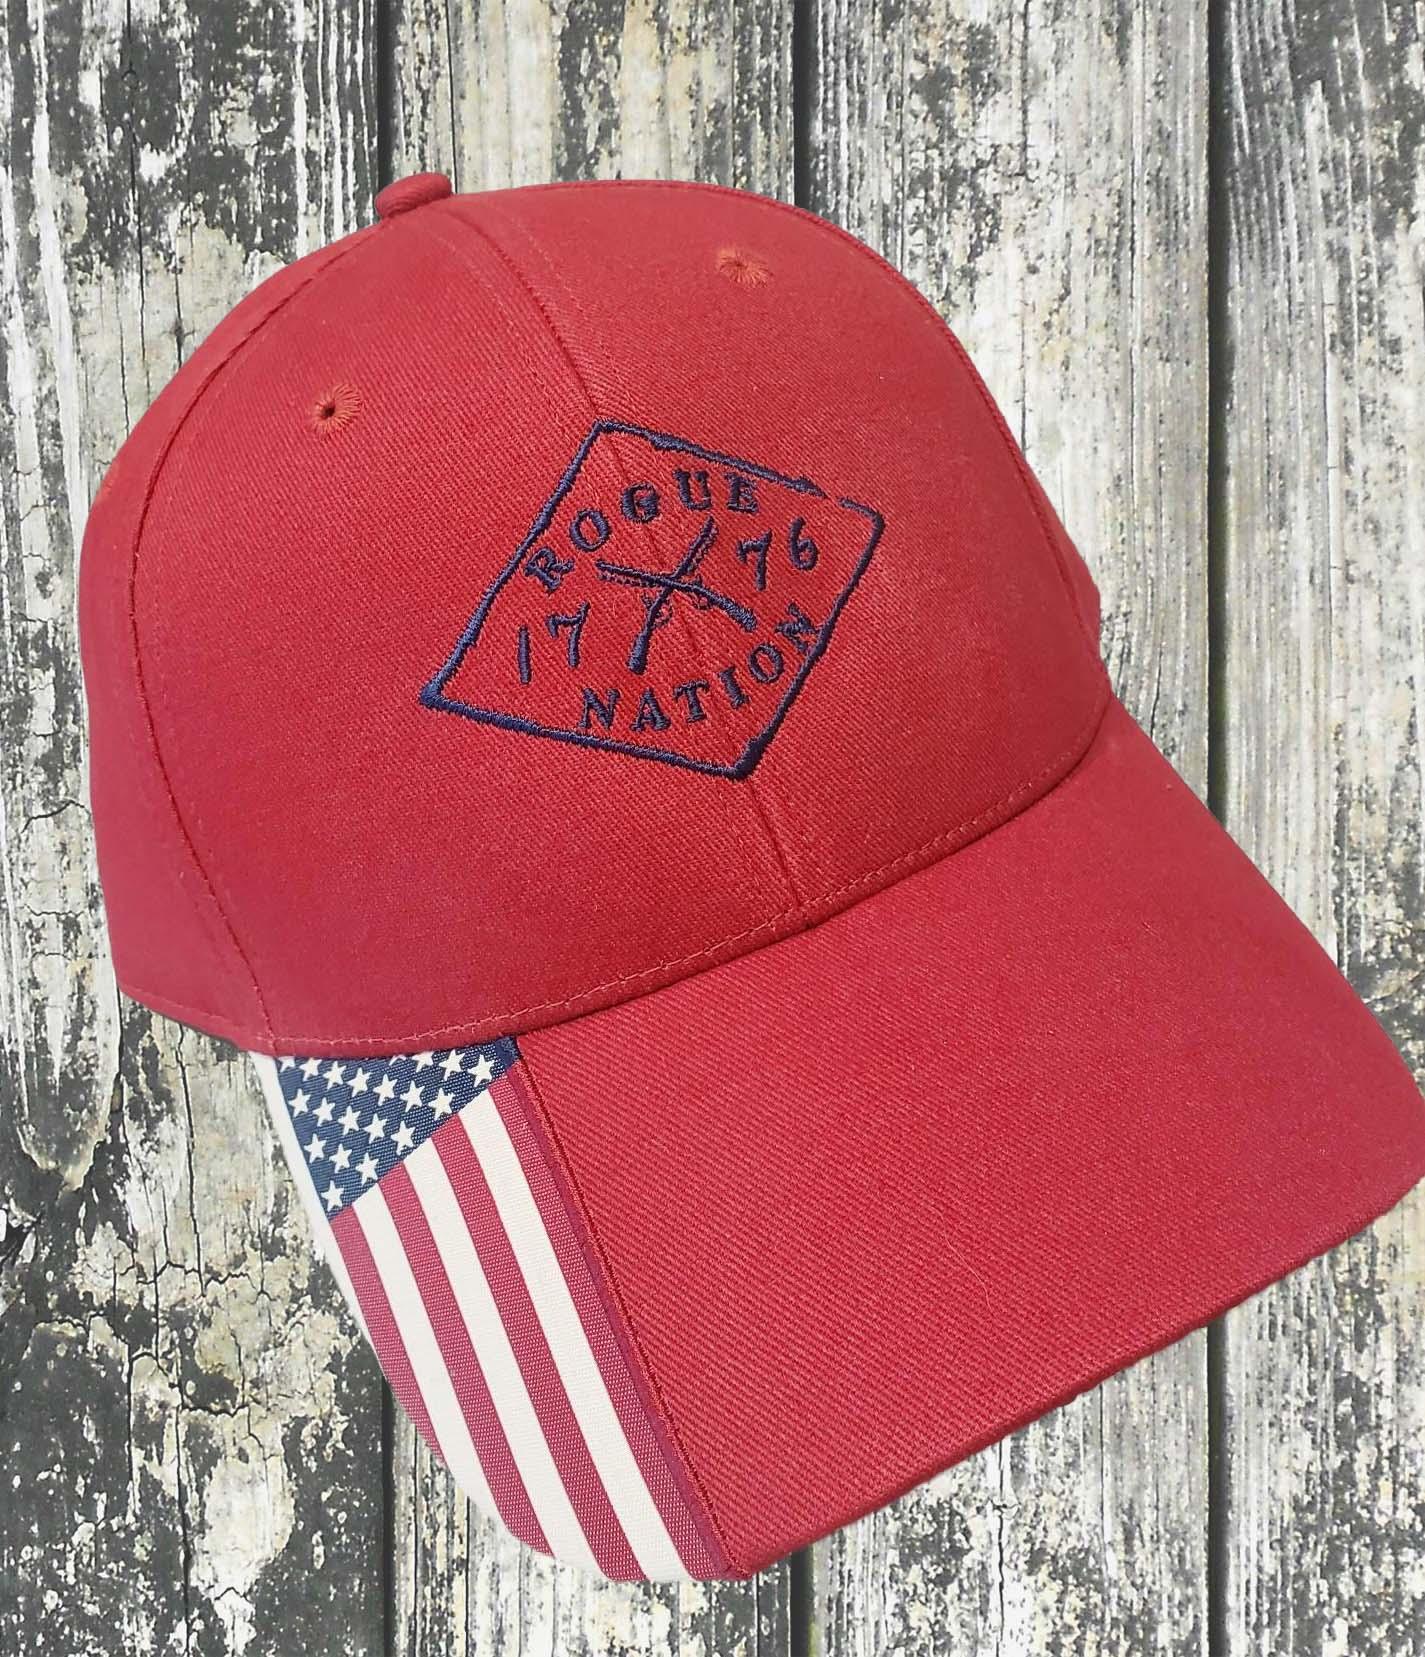 Outdoor Cap, American Flag